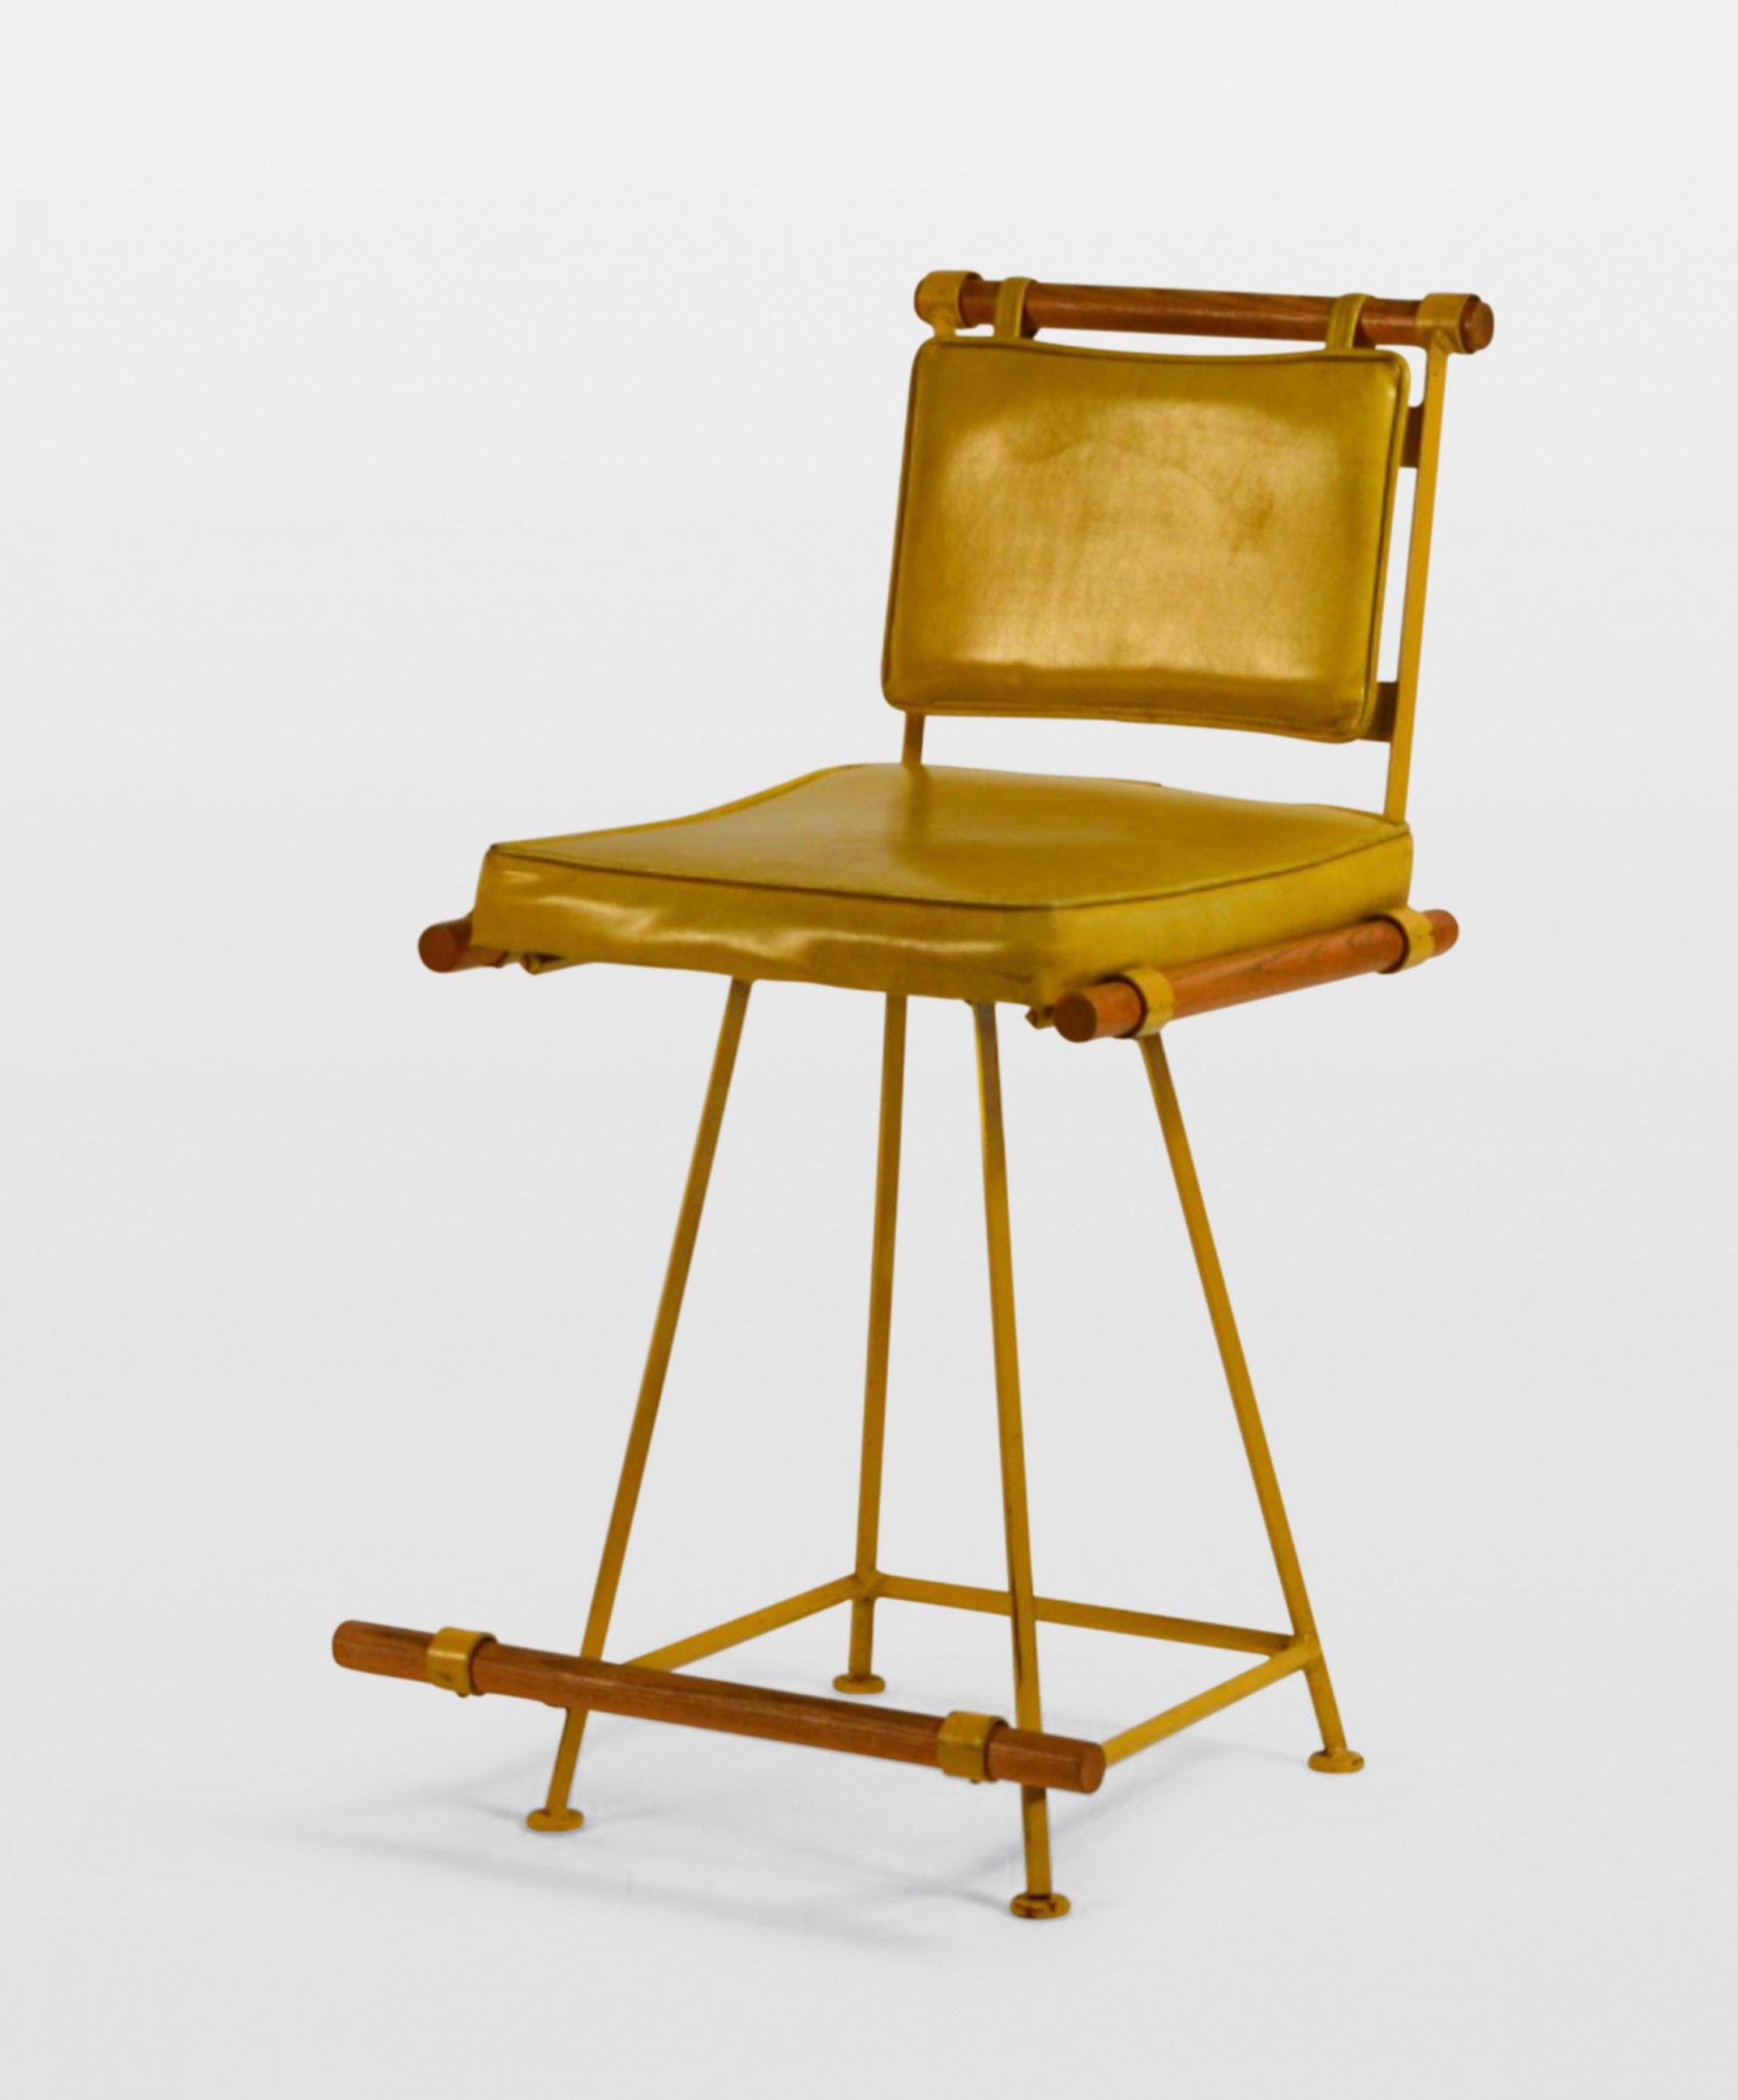 Counter stool, c 1970s, by Cleo Baldon